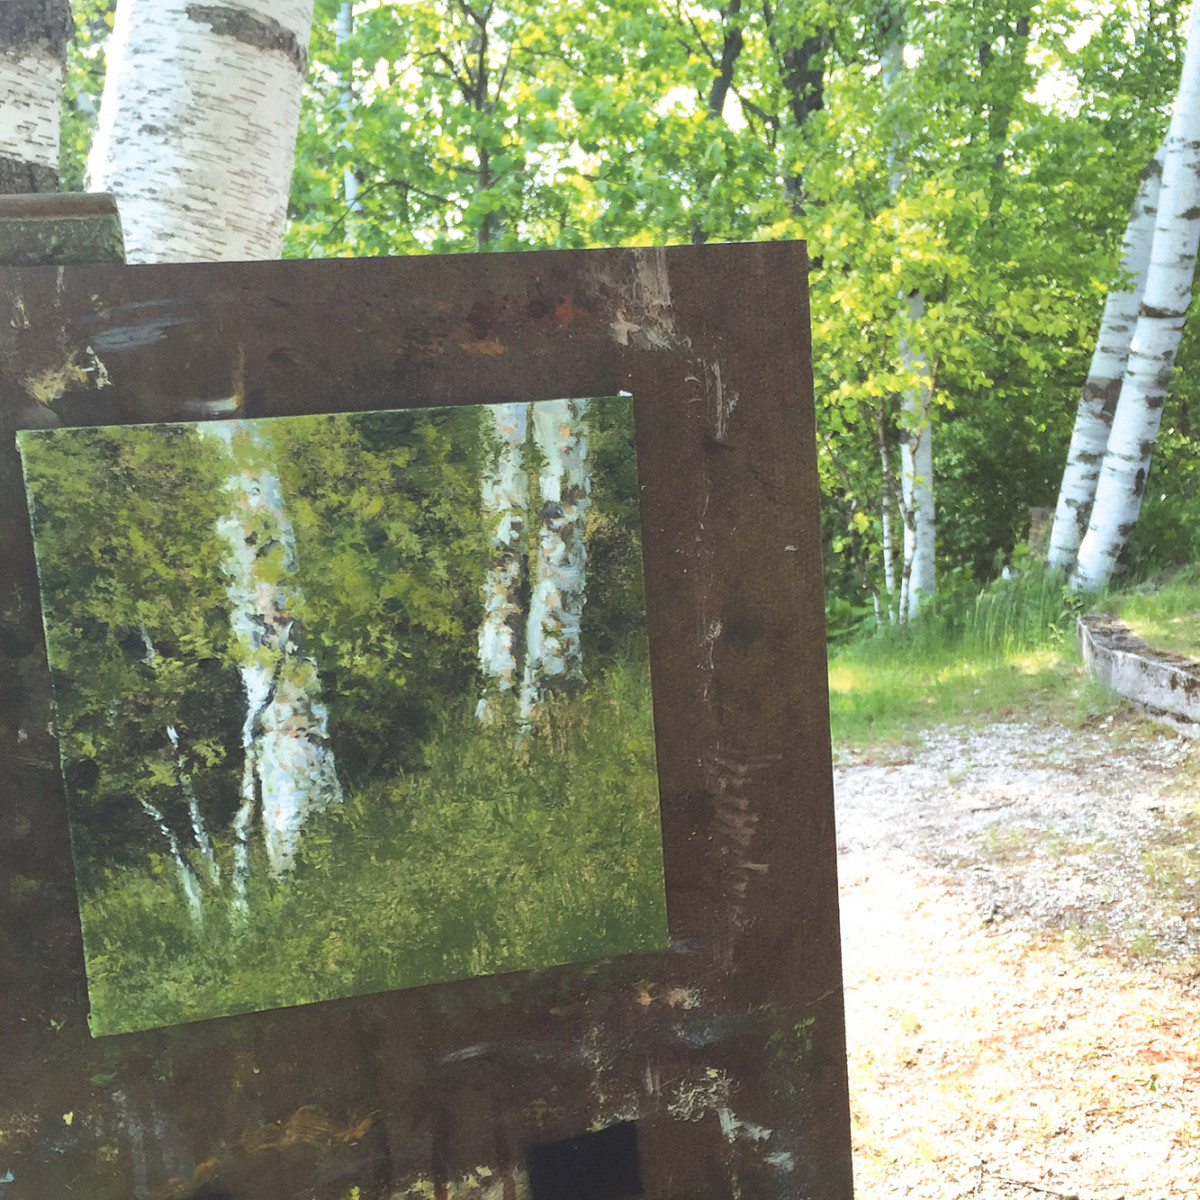 Painting en plein air, in process among birch trees in Beulah, Michigan.